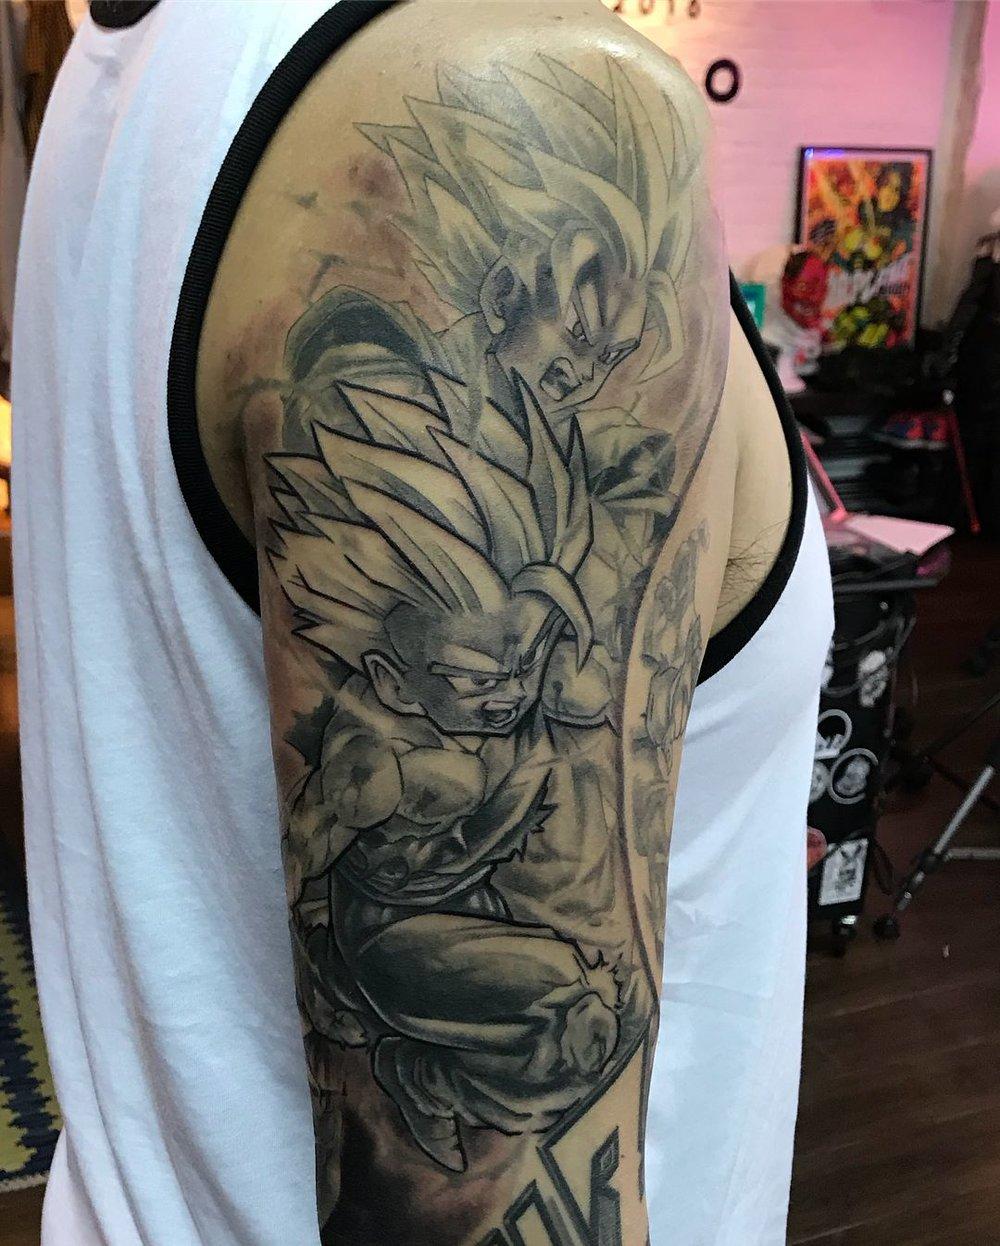 2018-fridays-tattoo-hong-kong-jamie-one-piece-dragon-ball-sleeve-1.jpg